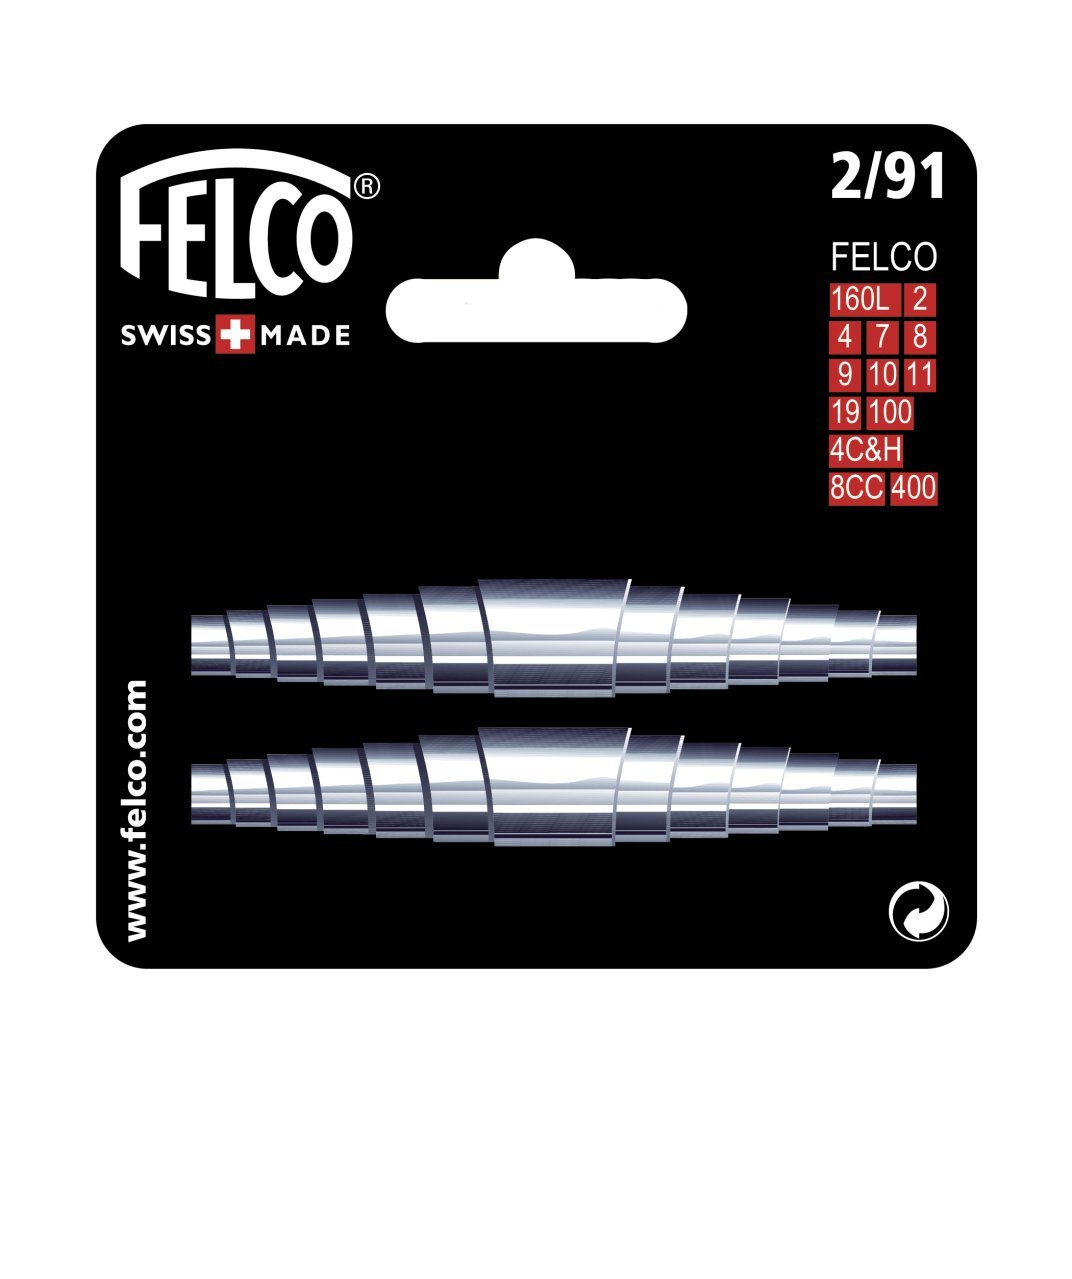 Replacement Springs for FELCO F2, F4, F7, F8, F9, F10, F50, F51, F100, F160L